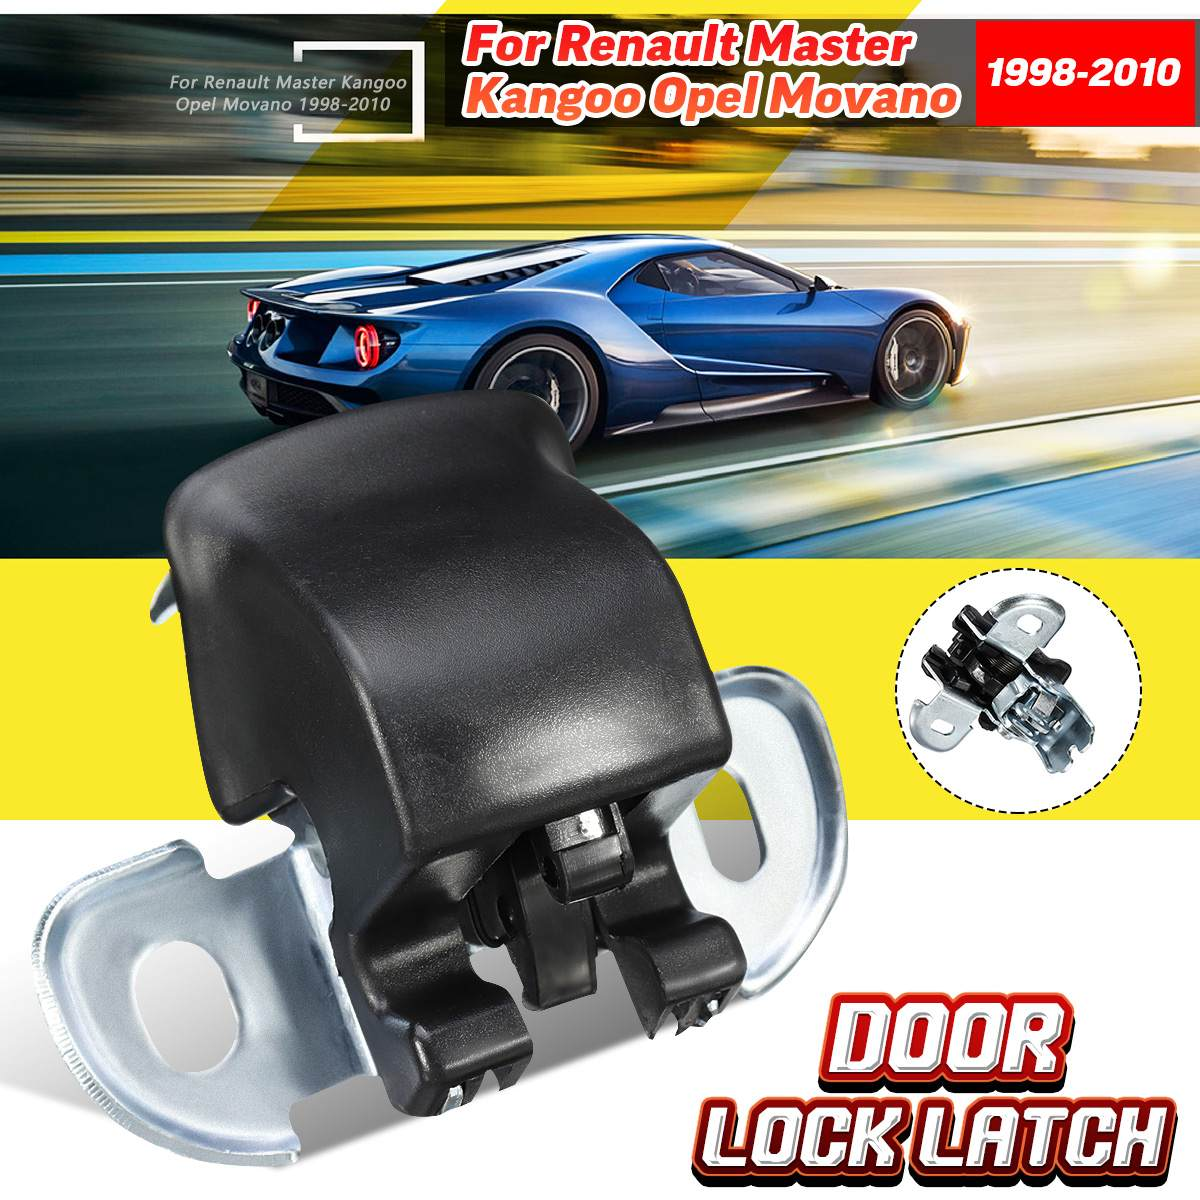 Rear Lower Door Lock Latch Catch For Renault Master Kangoo Opel Movano 1998-2010